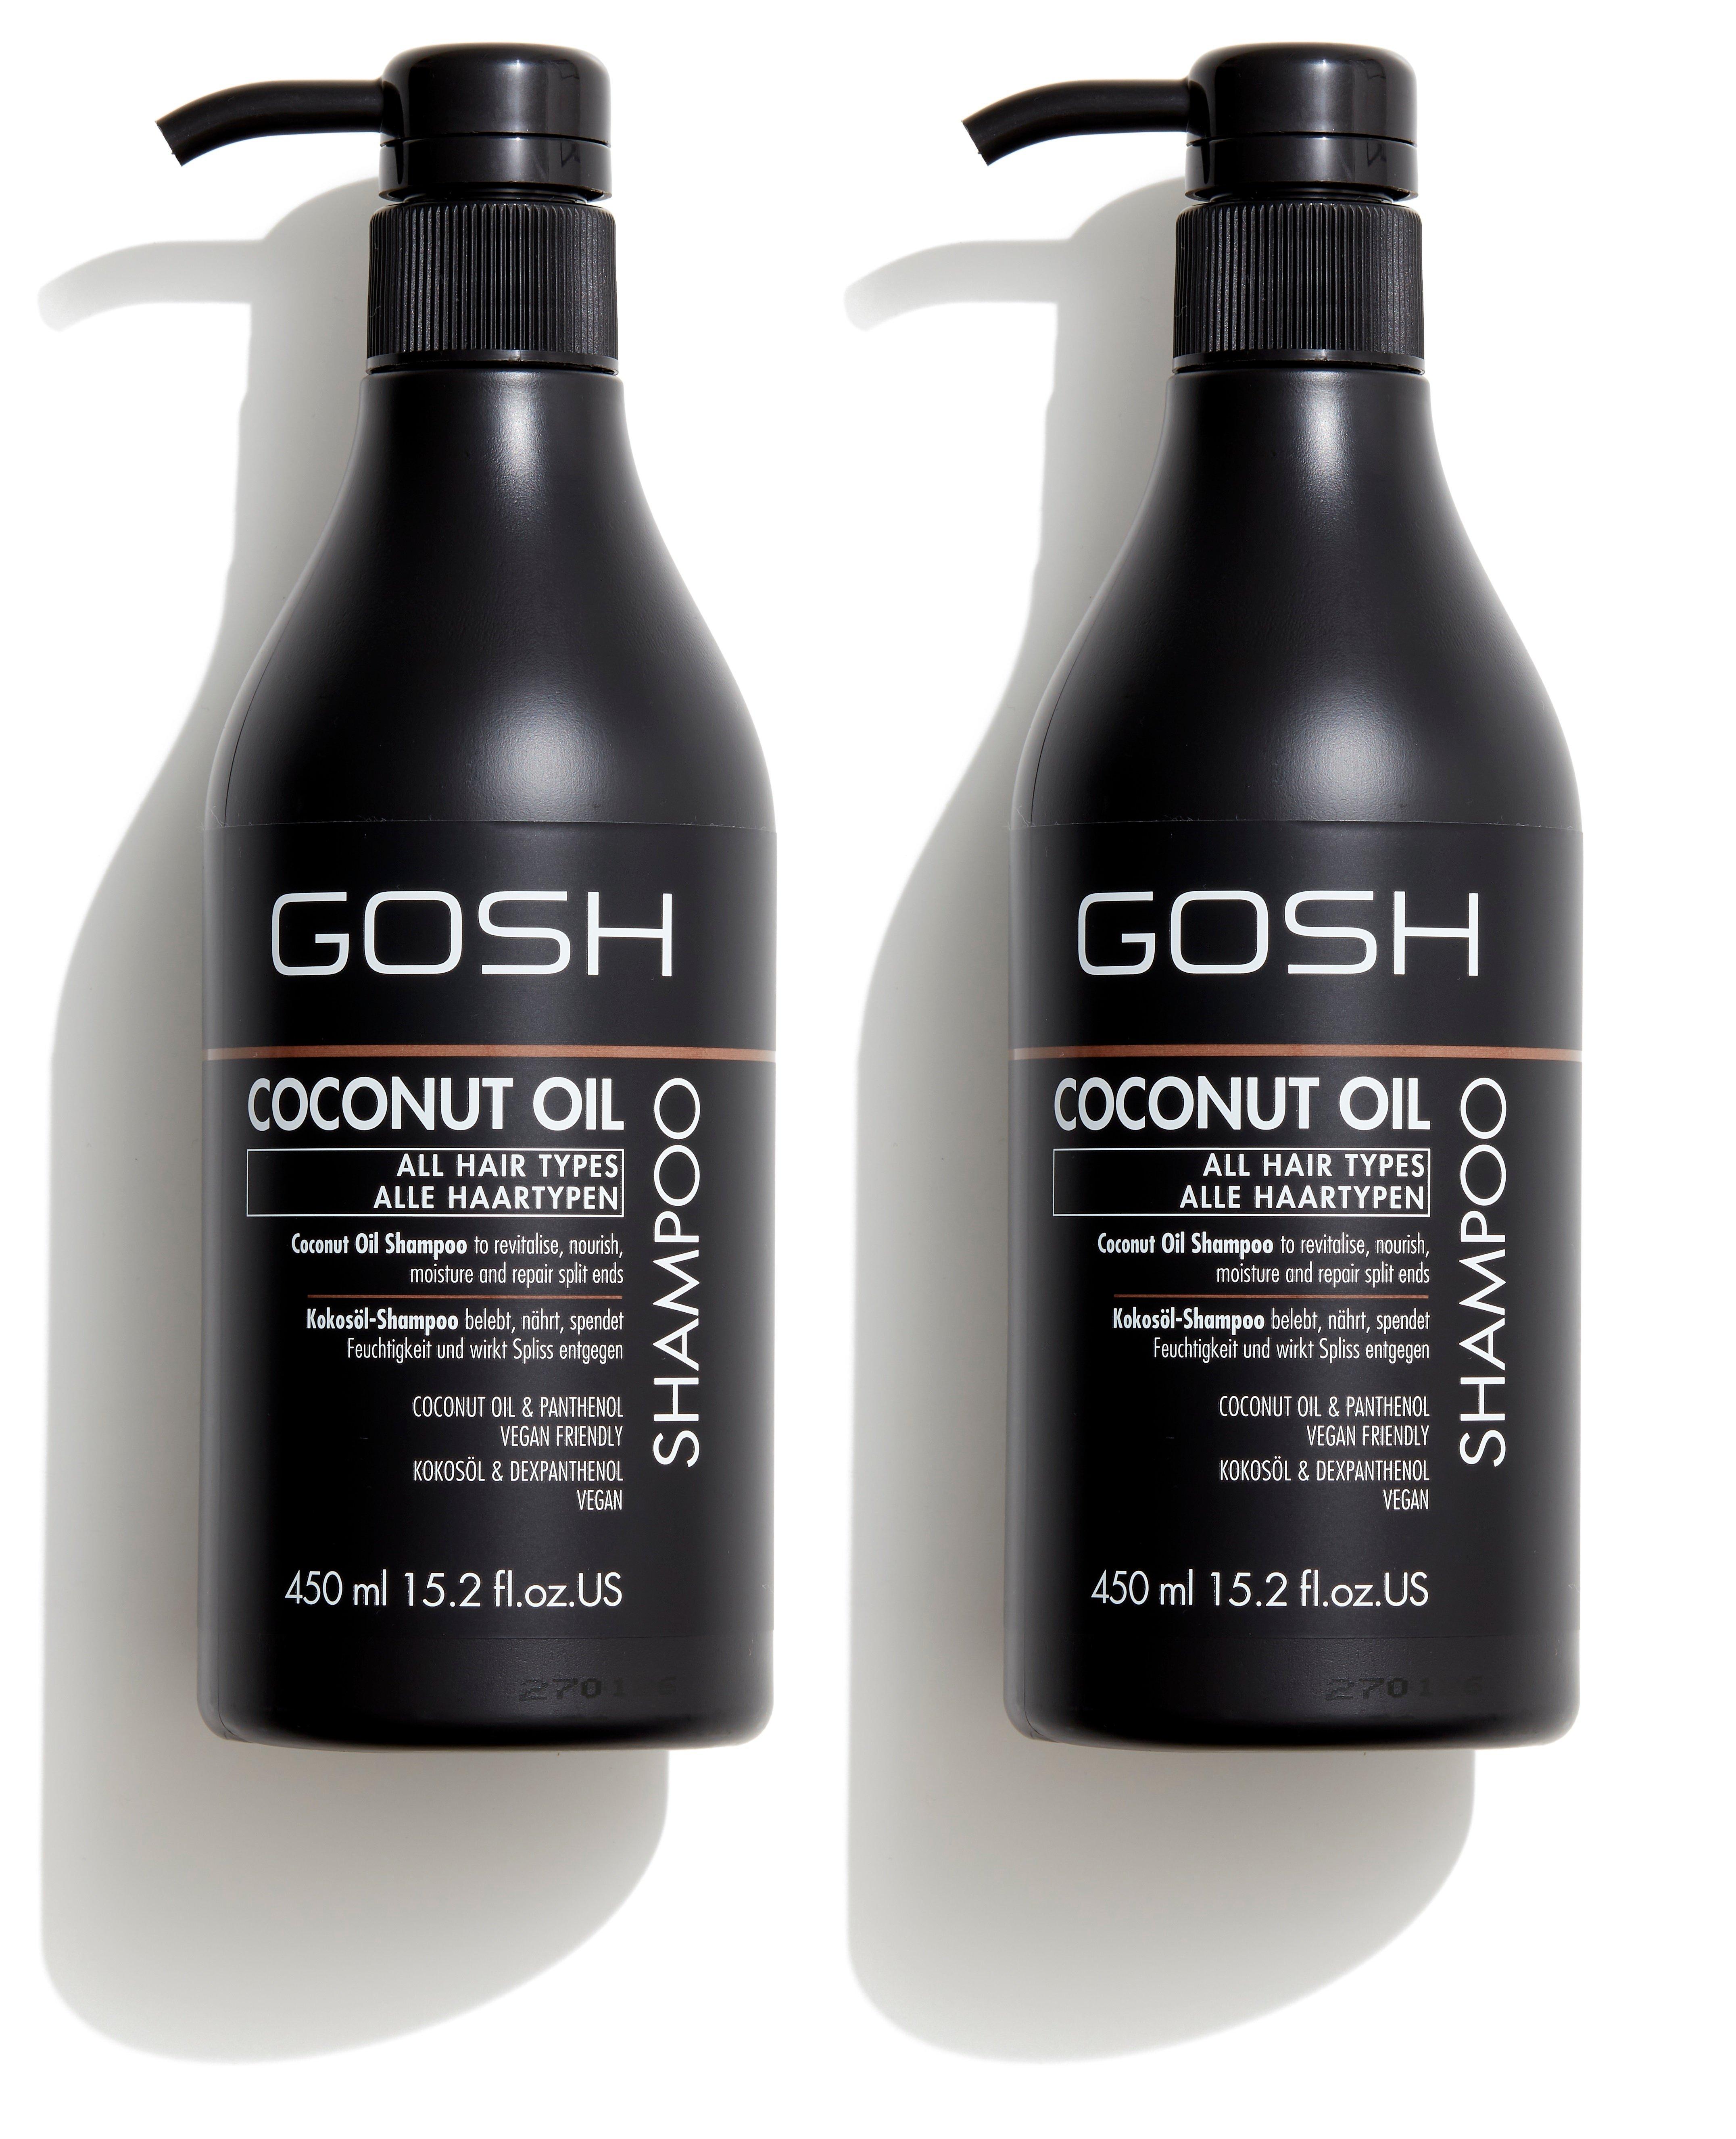 GOSH - 2 x Coconut Oil Shampoo 450 ml